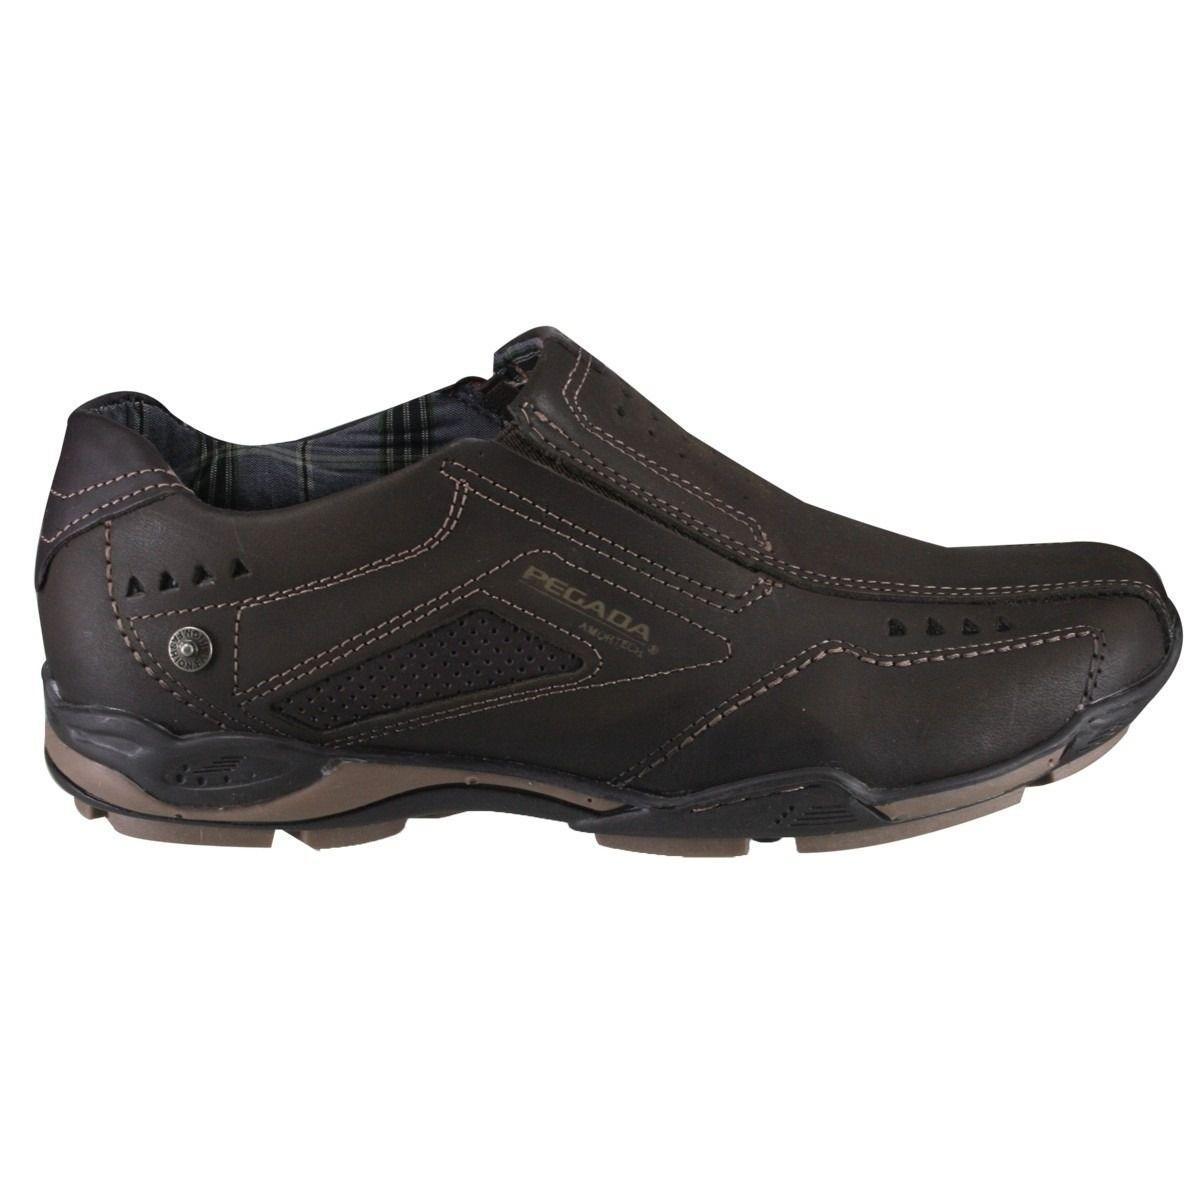 Sapato Sapatênis Masculino Pegada 112663-04 Couro MARROM